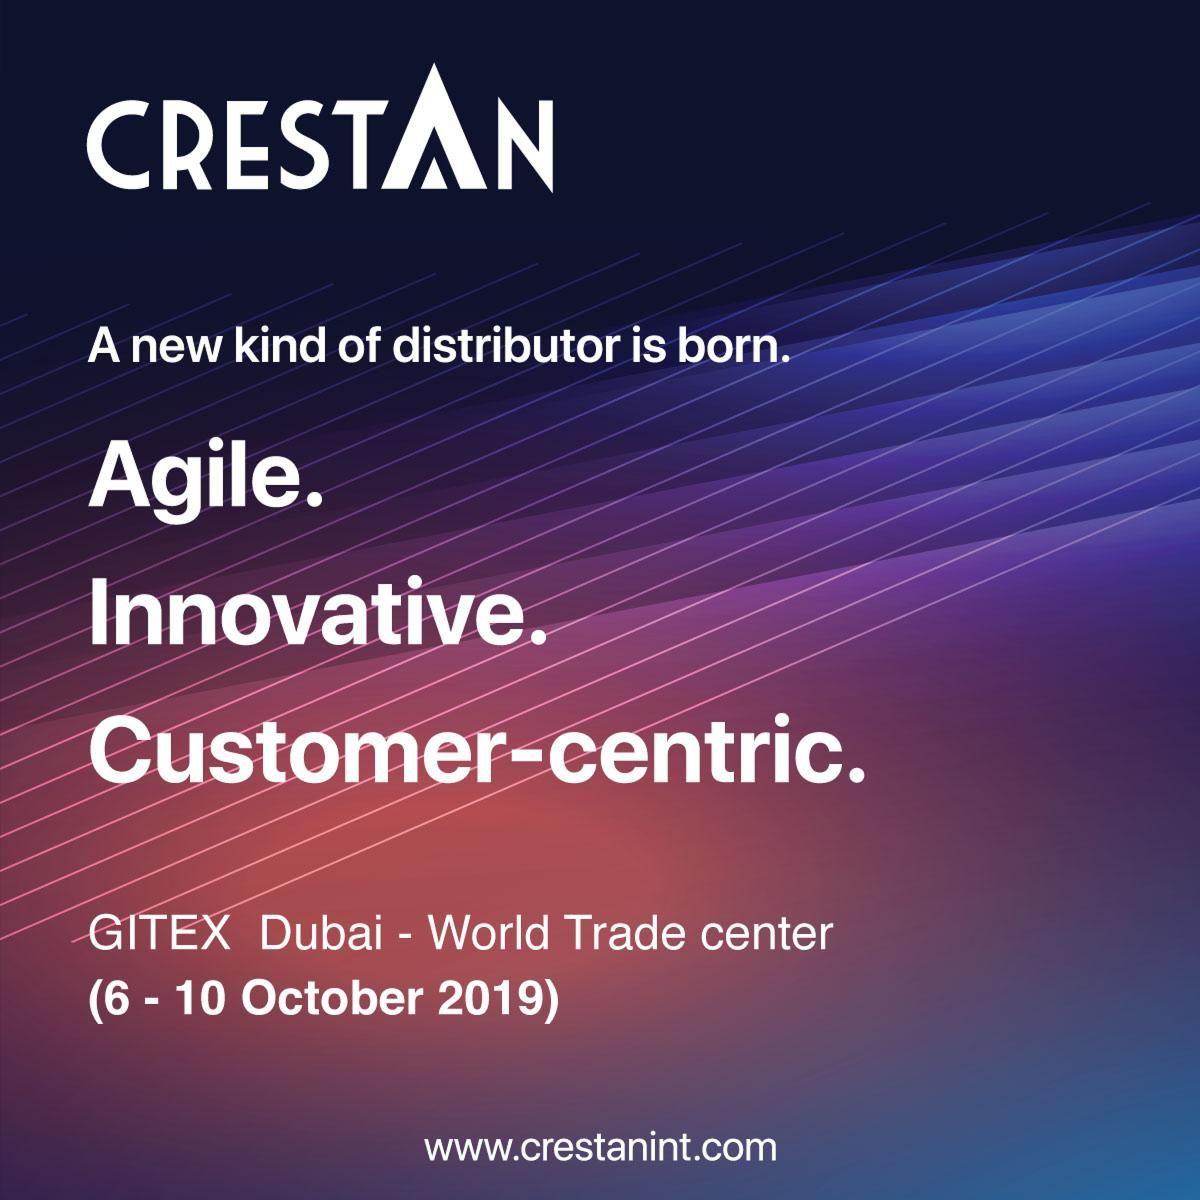 Crestan International